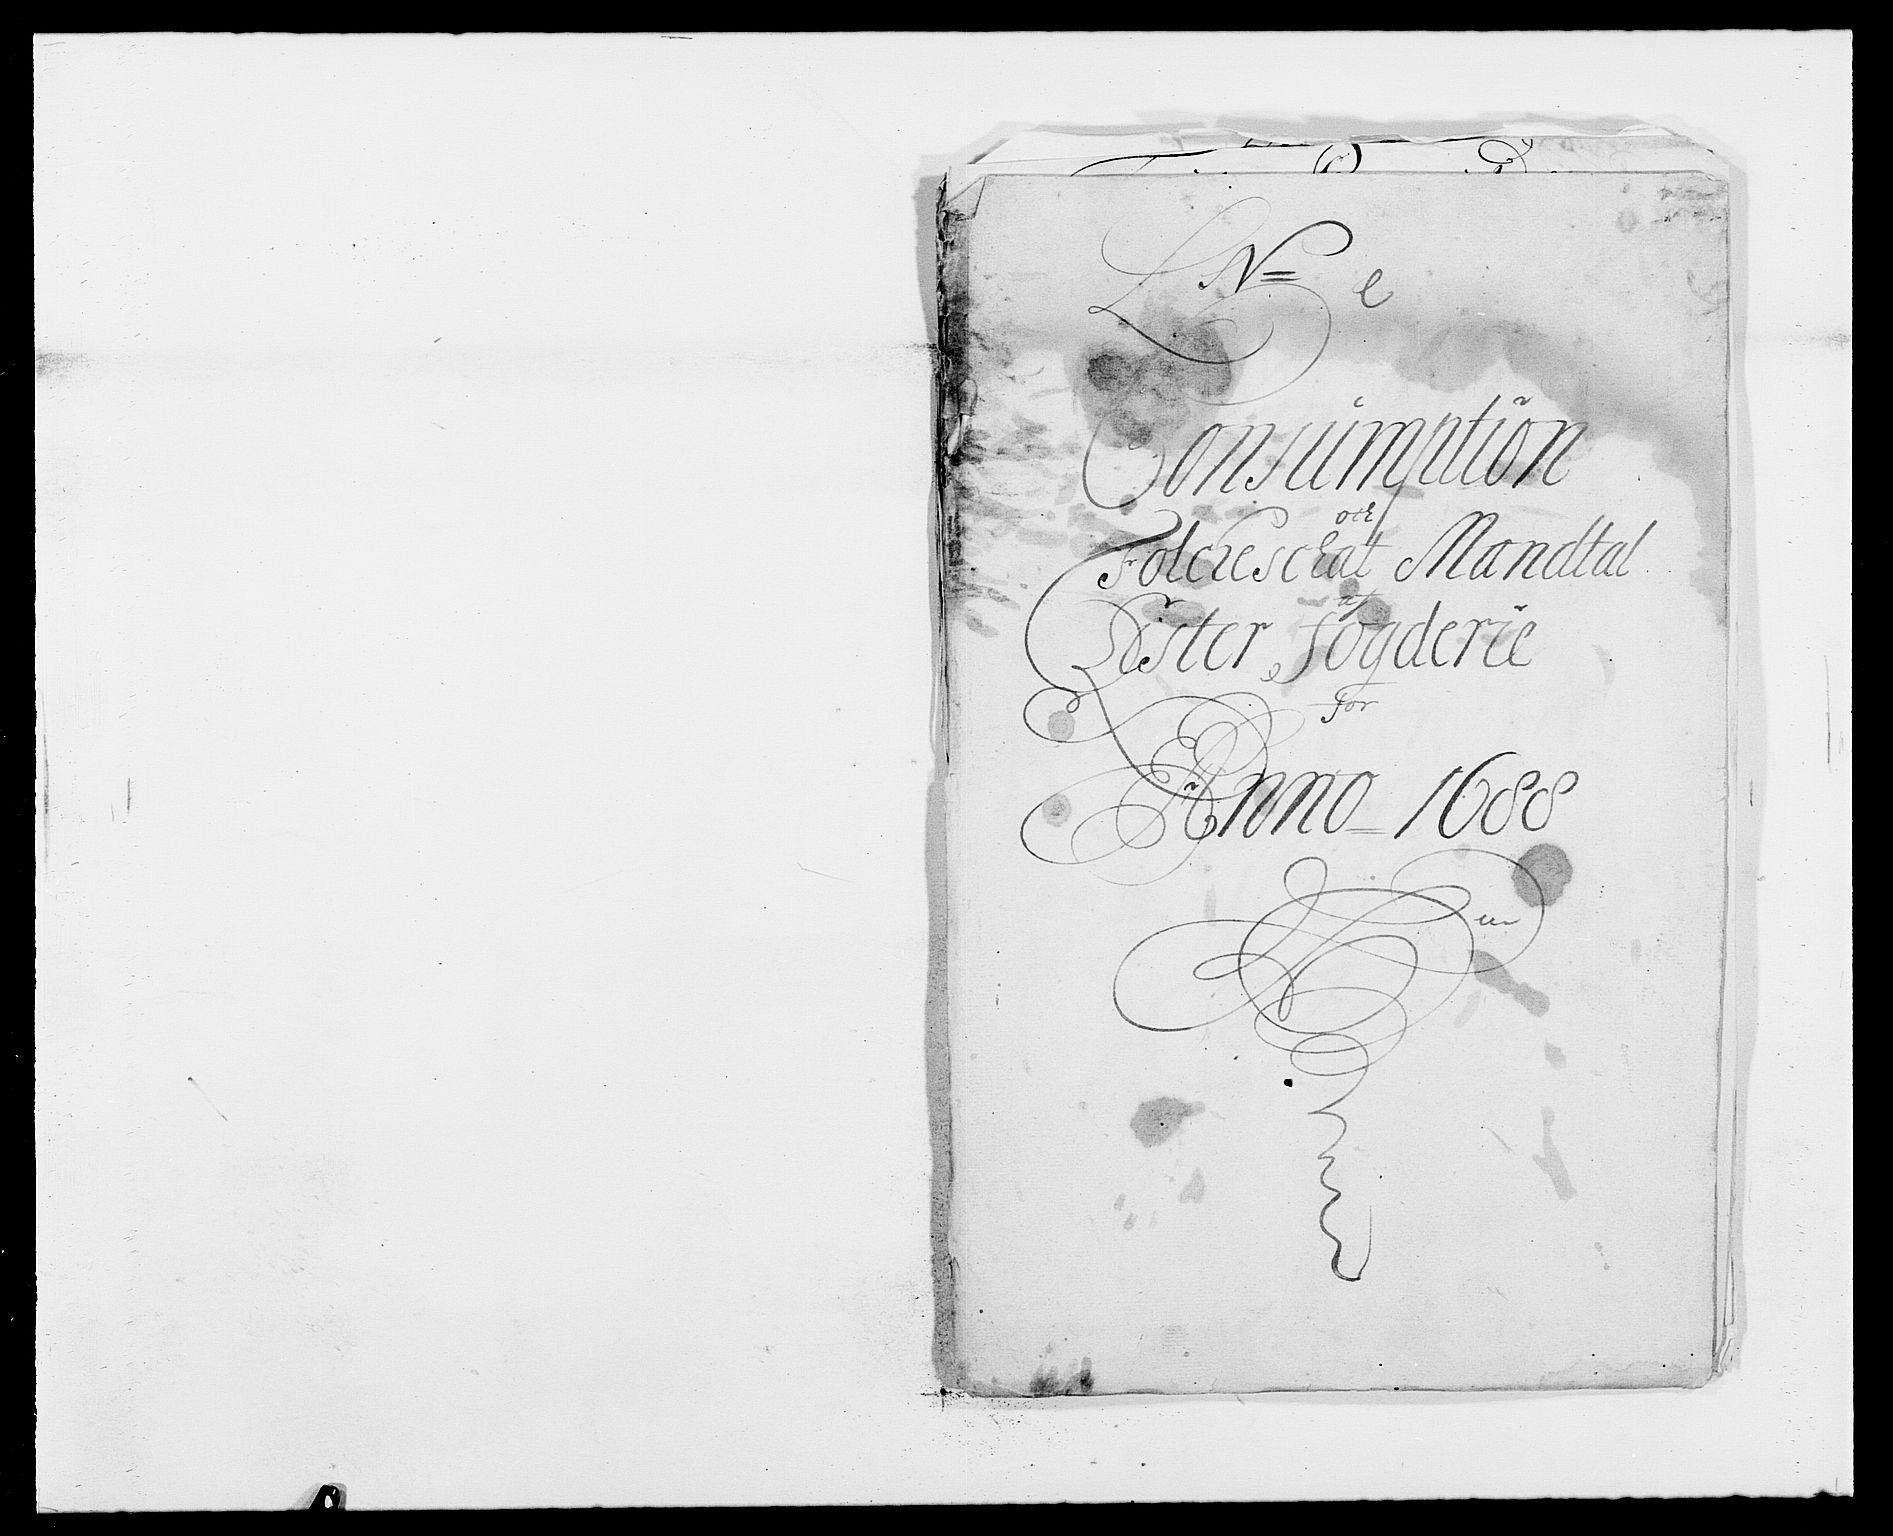 RA, Rentekammeret inntil 1814, Reviderte regnskaper, Fogderegnskap, R41/L2534: Fogderegnskap Lista, 1686-1688, s. 236